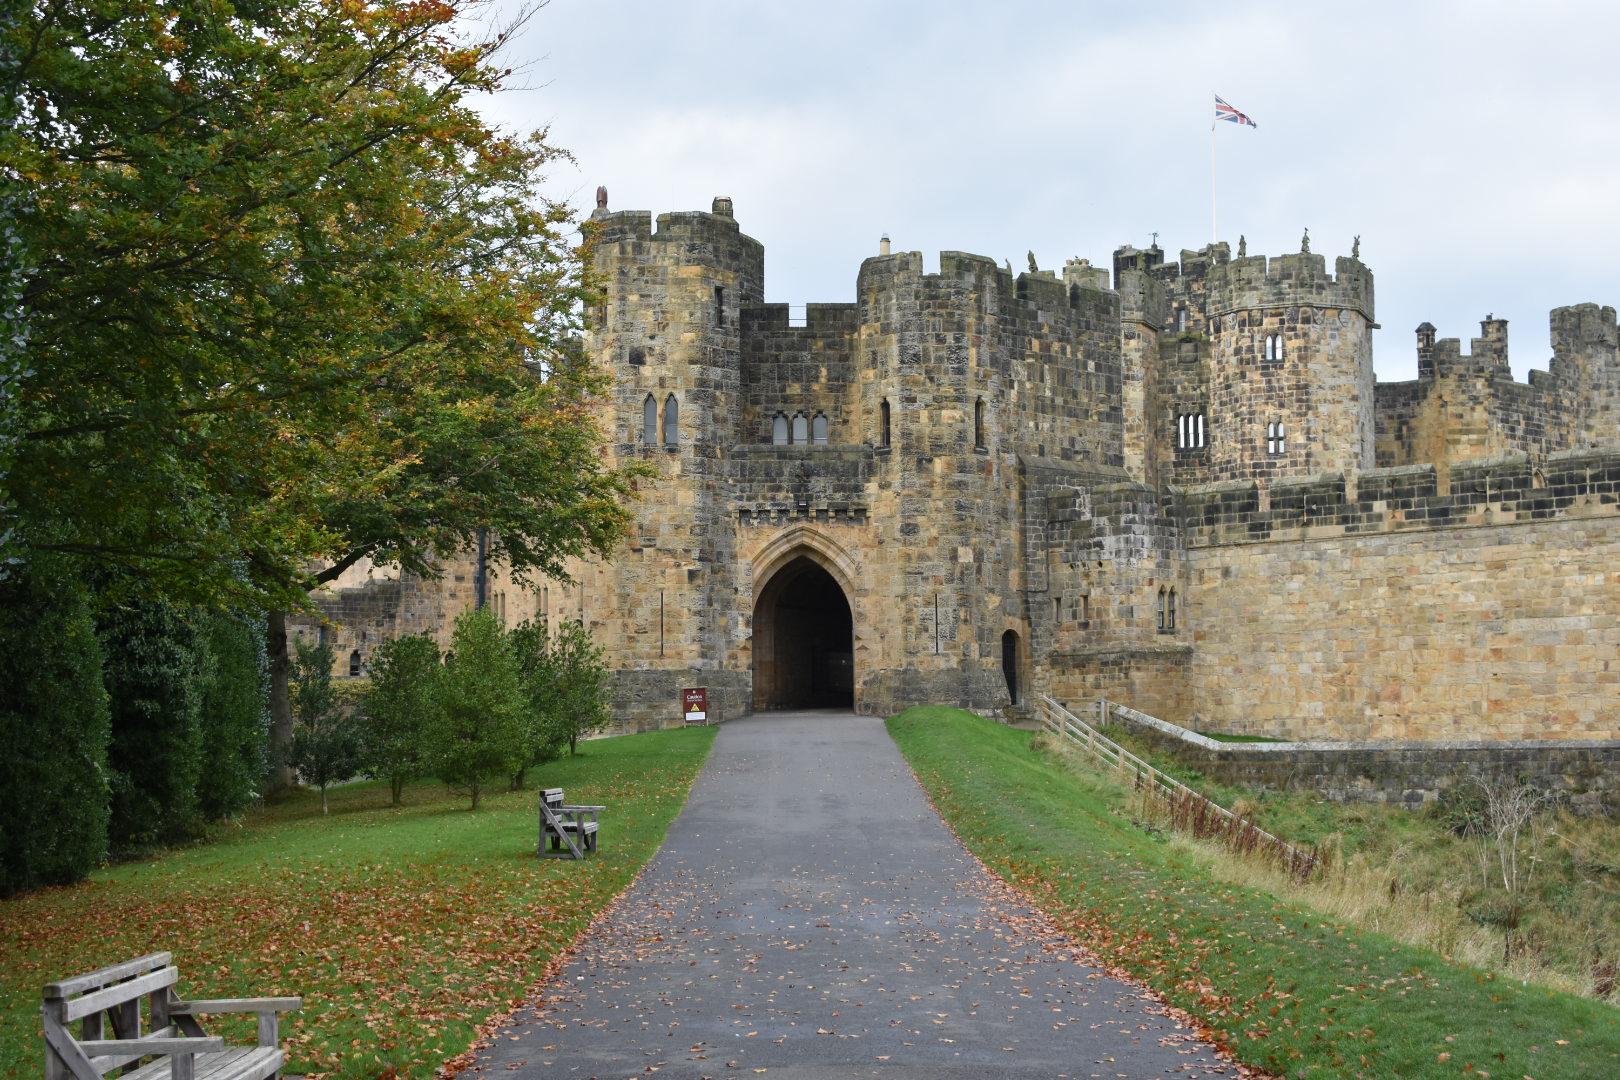 Alnwick Castle, Alnwick, England